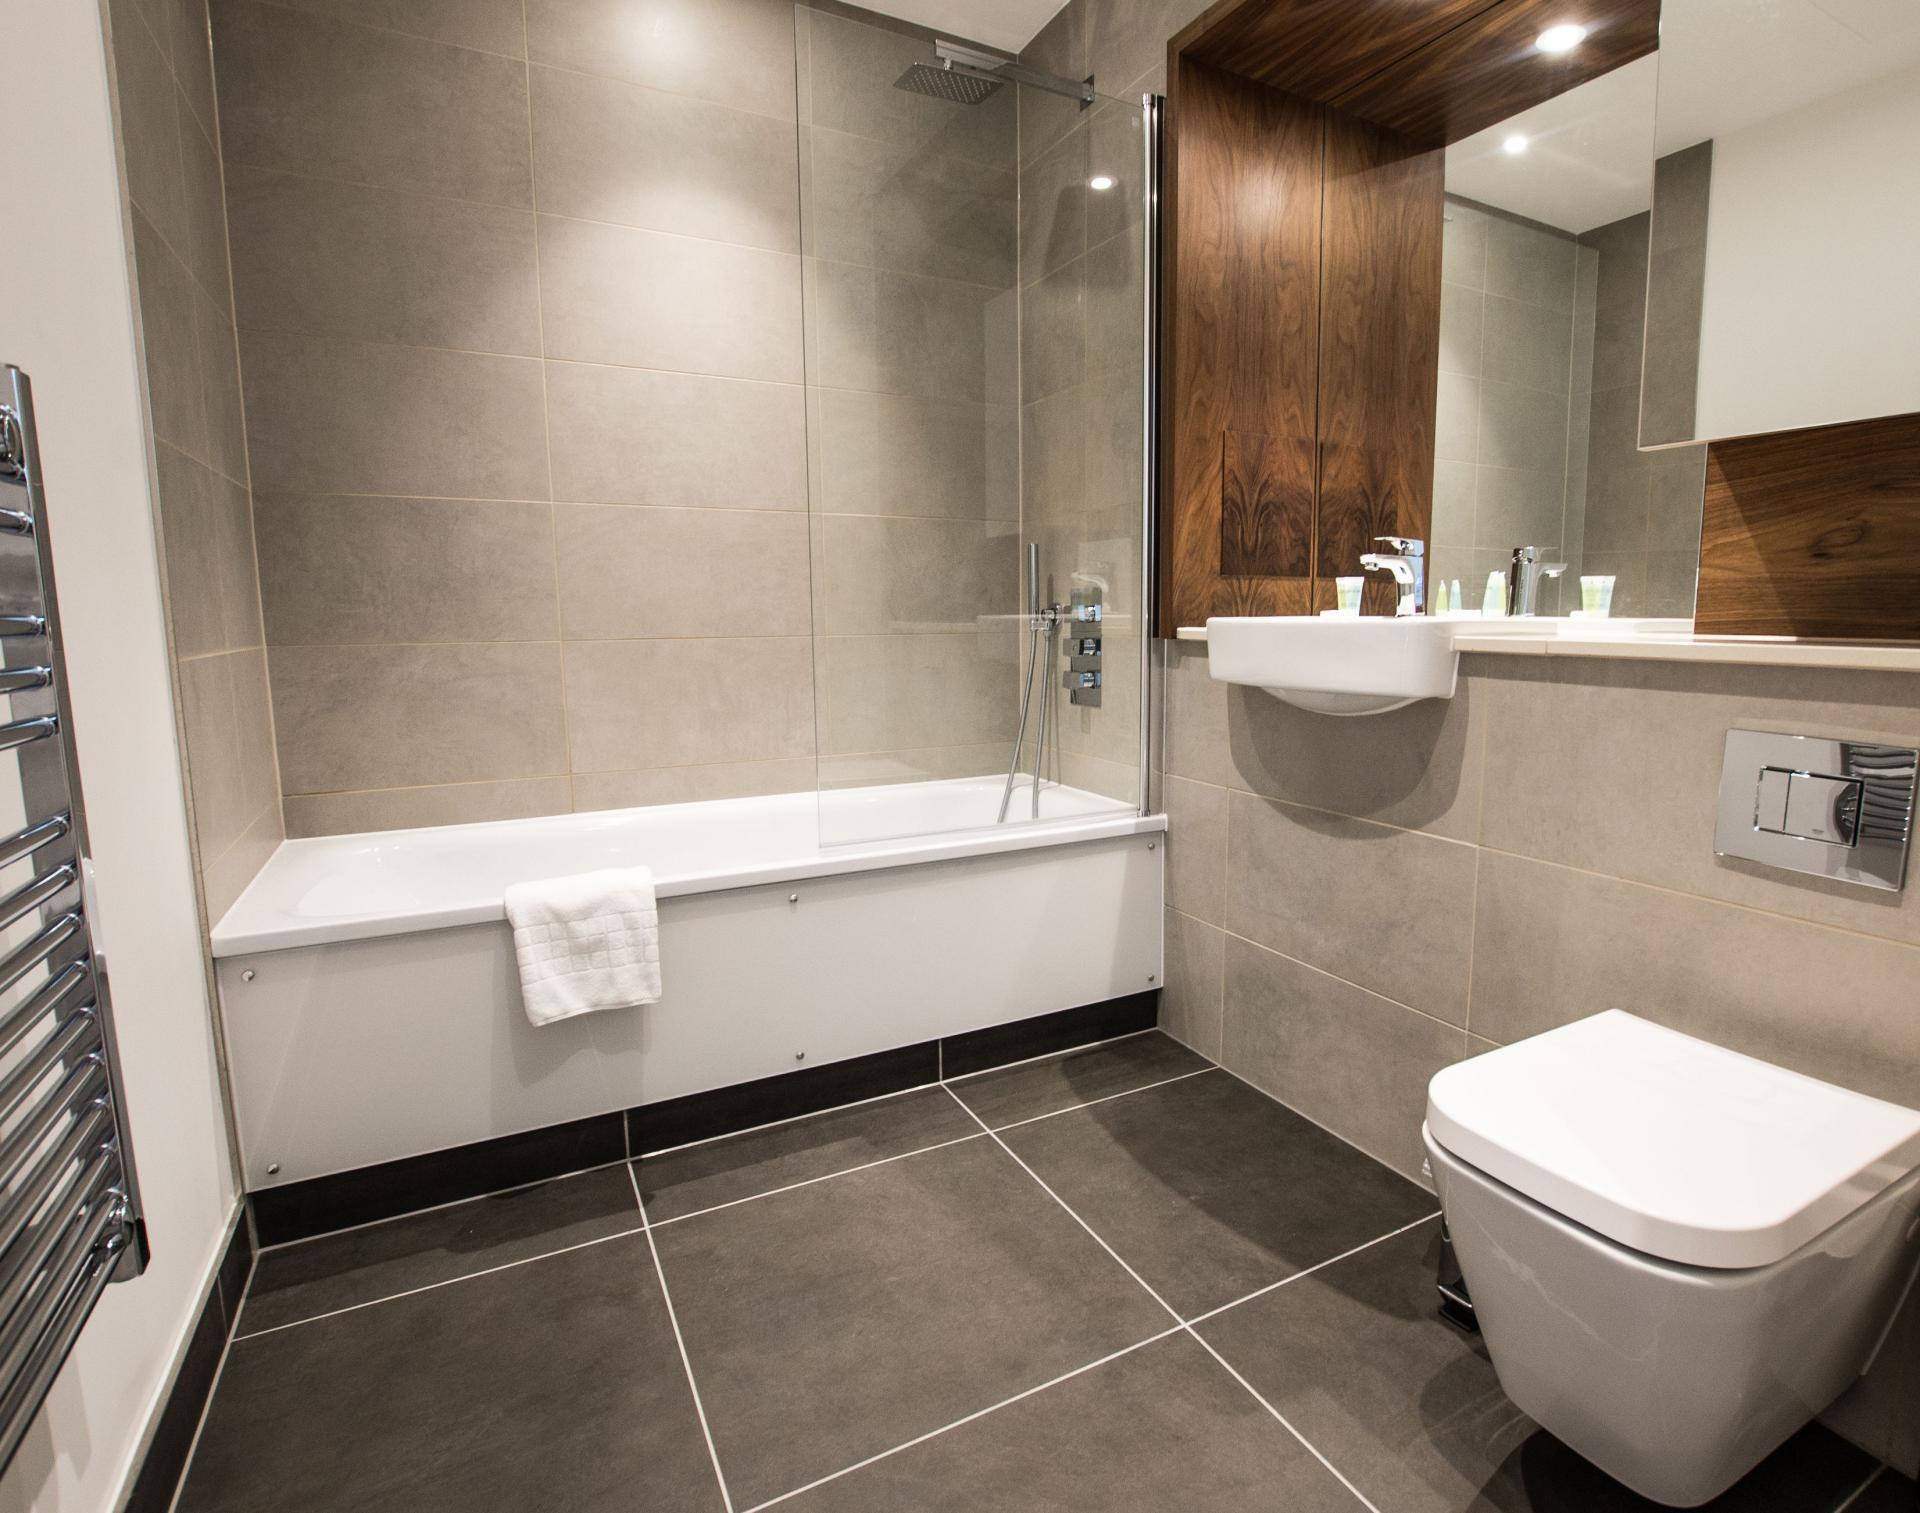 Bath at Canary Wharf Apartments By Charles Hope, Canary Wharf, London - Citybase Apartments